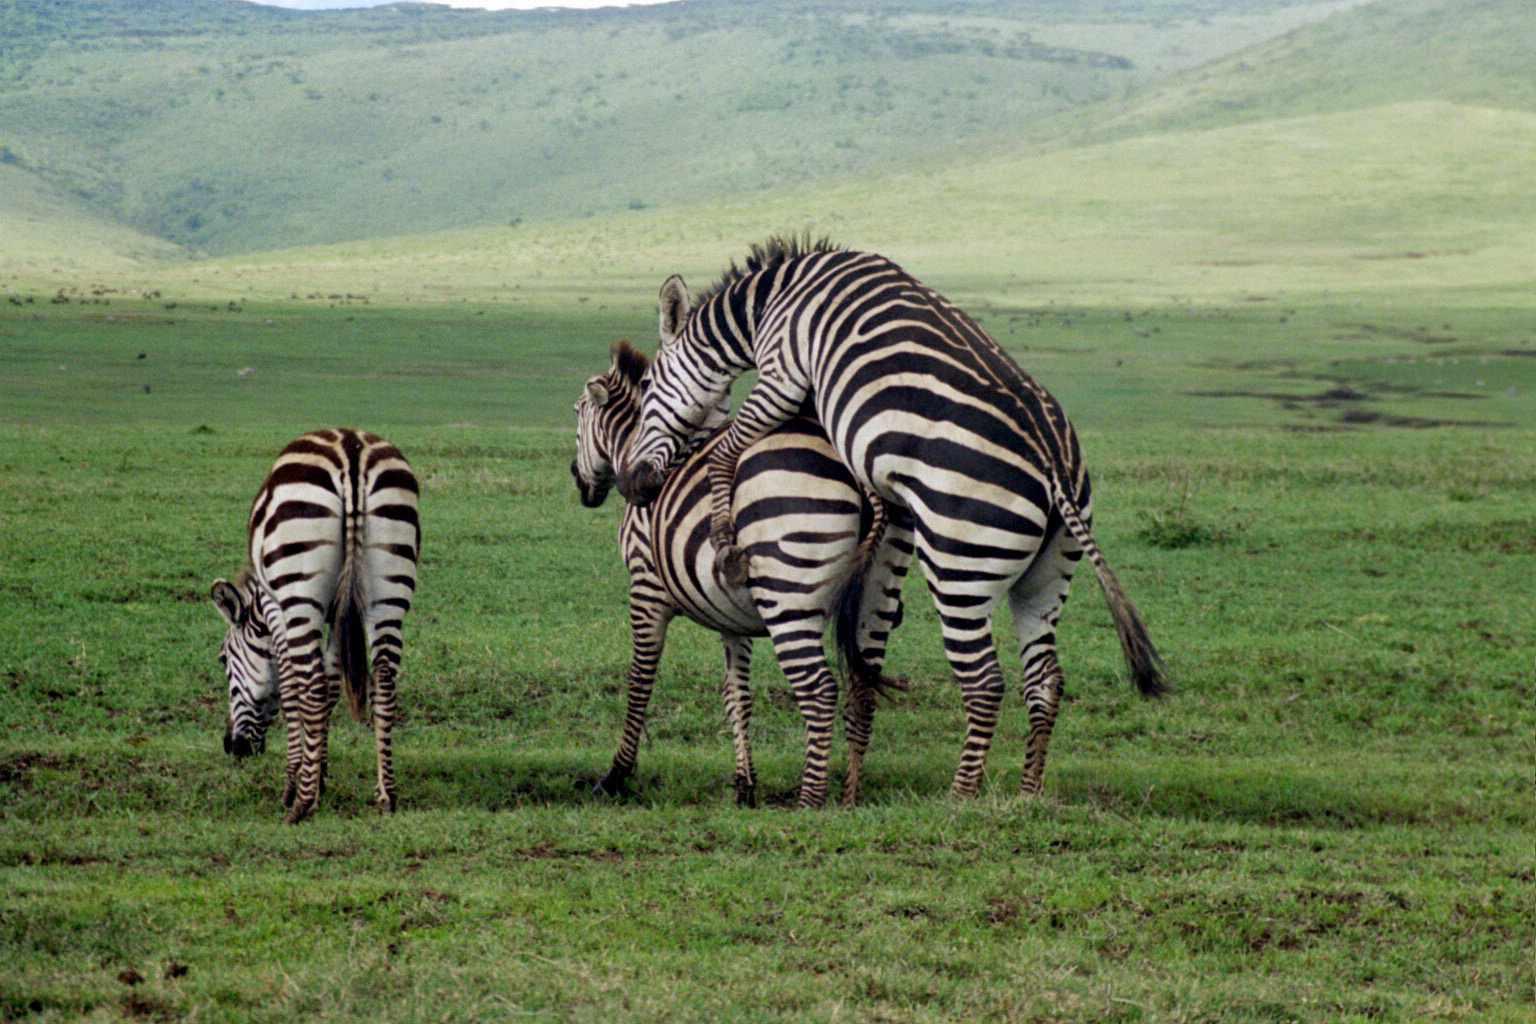 Zebras mating - photo#2